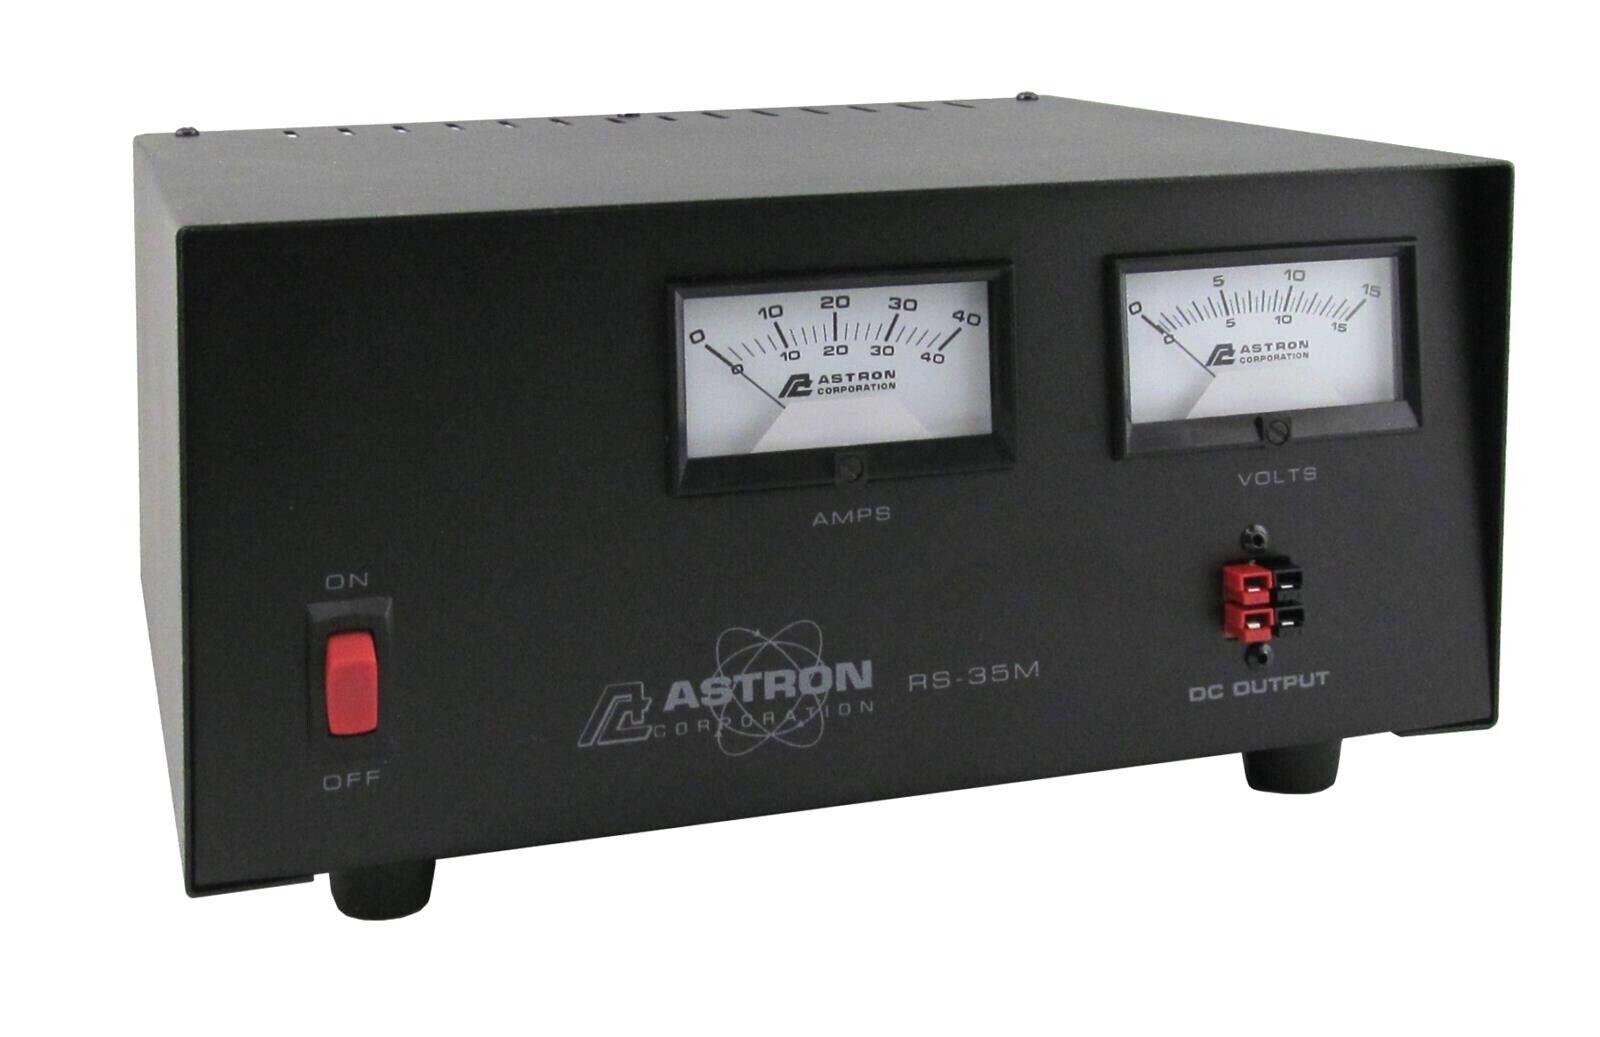 RS-35M alexg168 ASTRON POWER SUPPLY RS-35M-AP (latest model) 13.8VDC 35A. BRAND NEW W/ WARRANTY